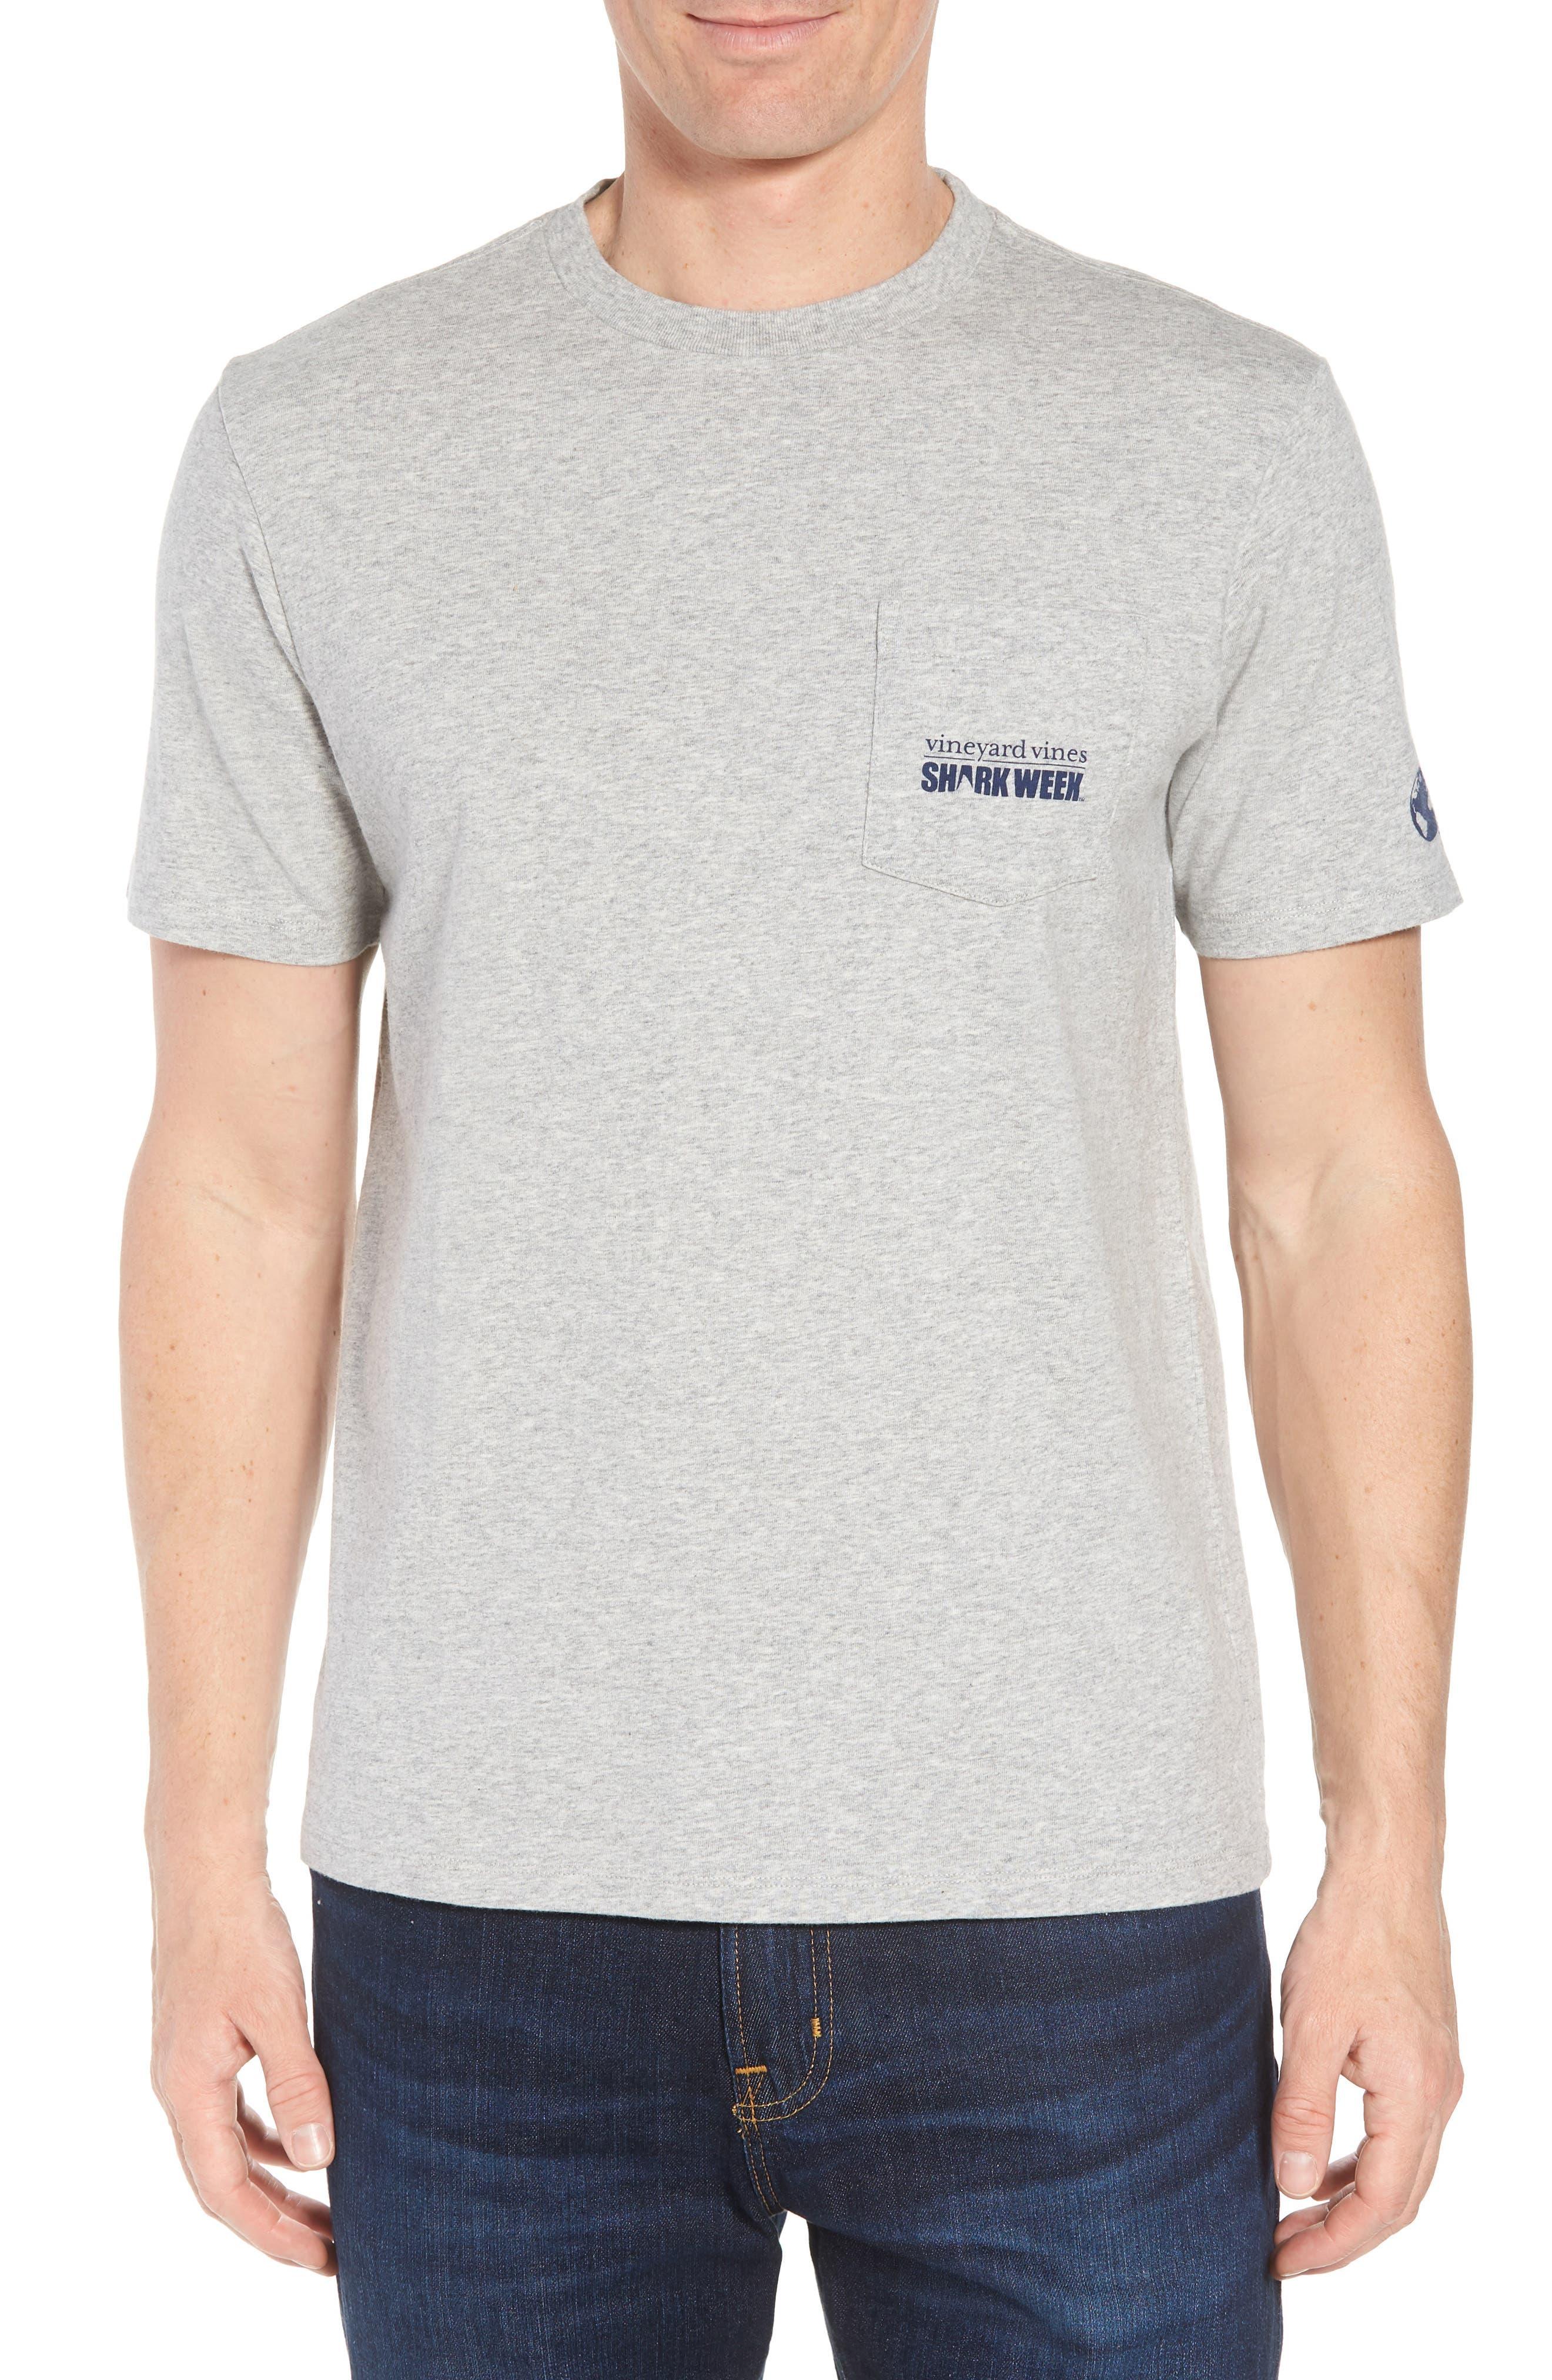 x Shark Week<sup>™</sup> Sharks & Stripes Pocket T-Shirt,                             Main thumbnail 1, color,                             Grey Heather